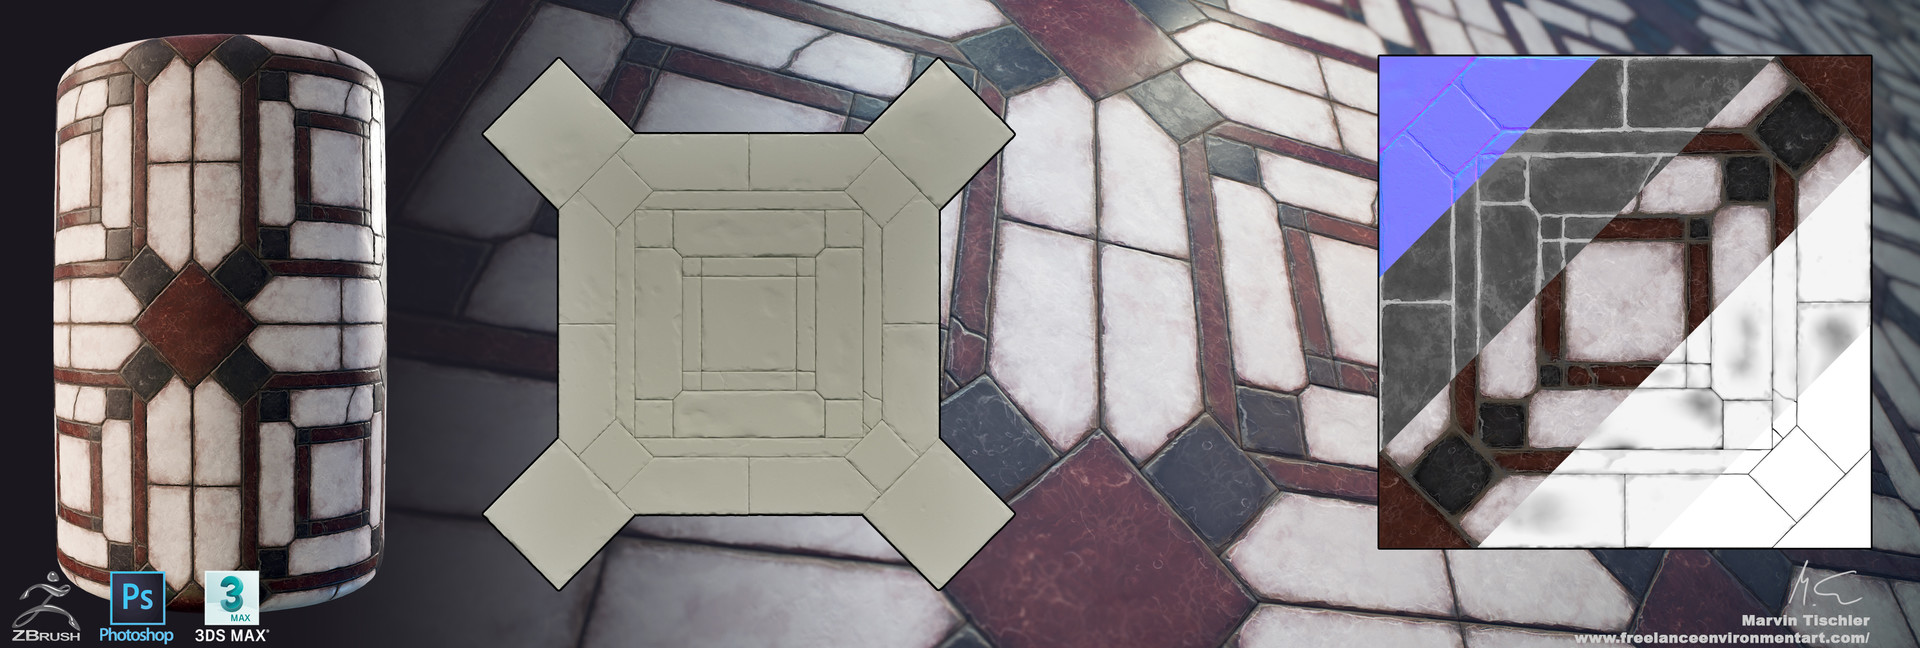 Marvin tischler textures 002 b